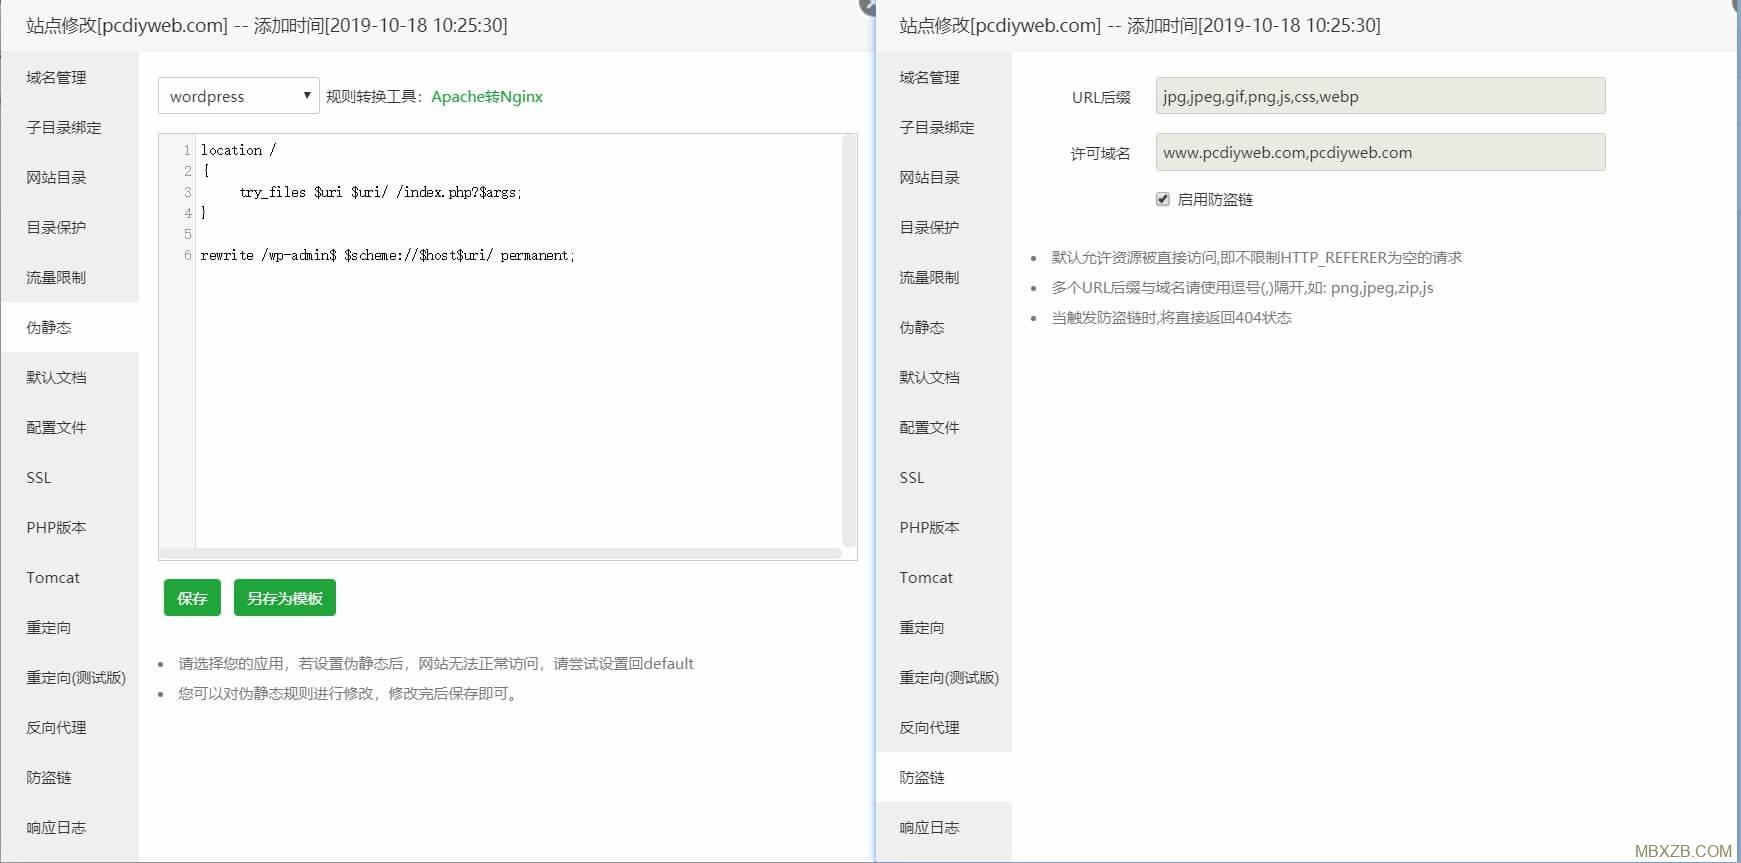 WordPress-NGINX伪静态